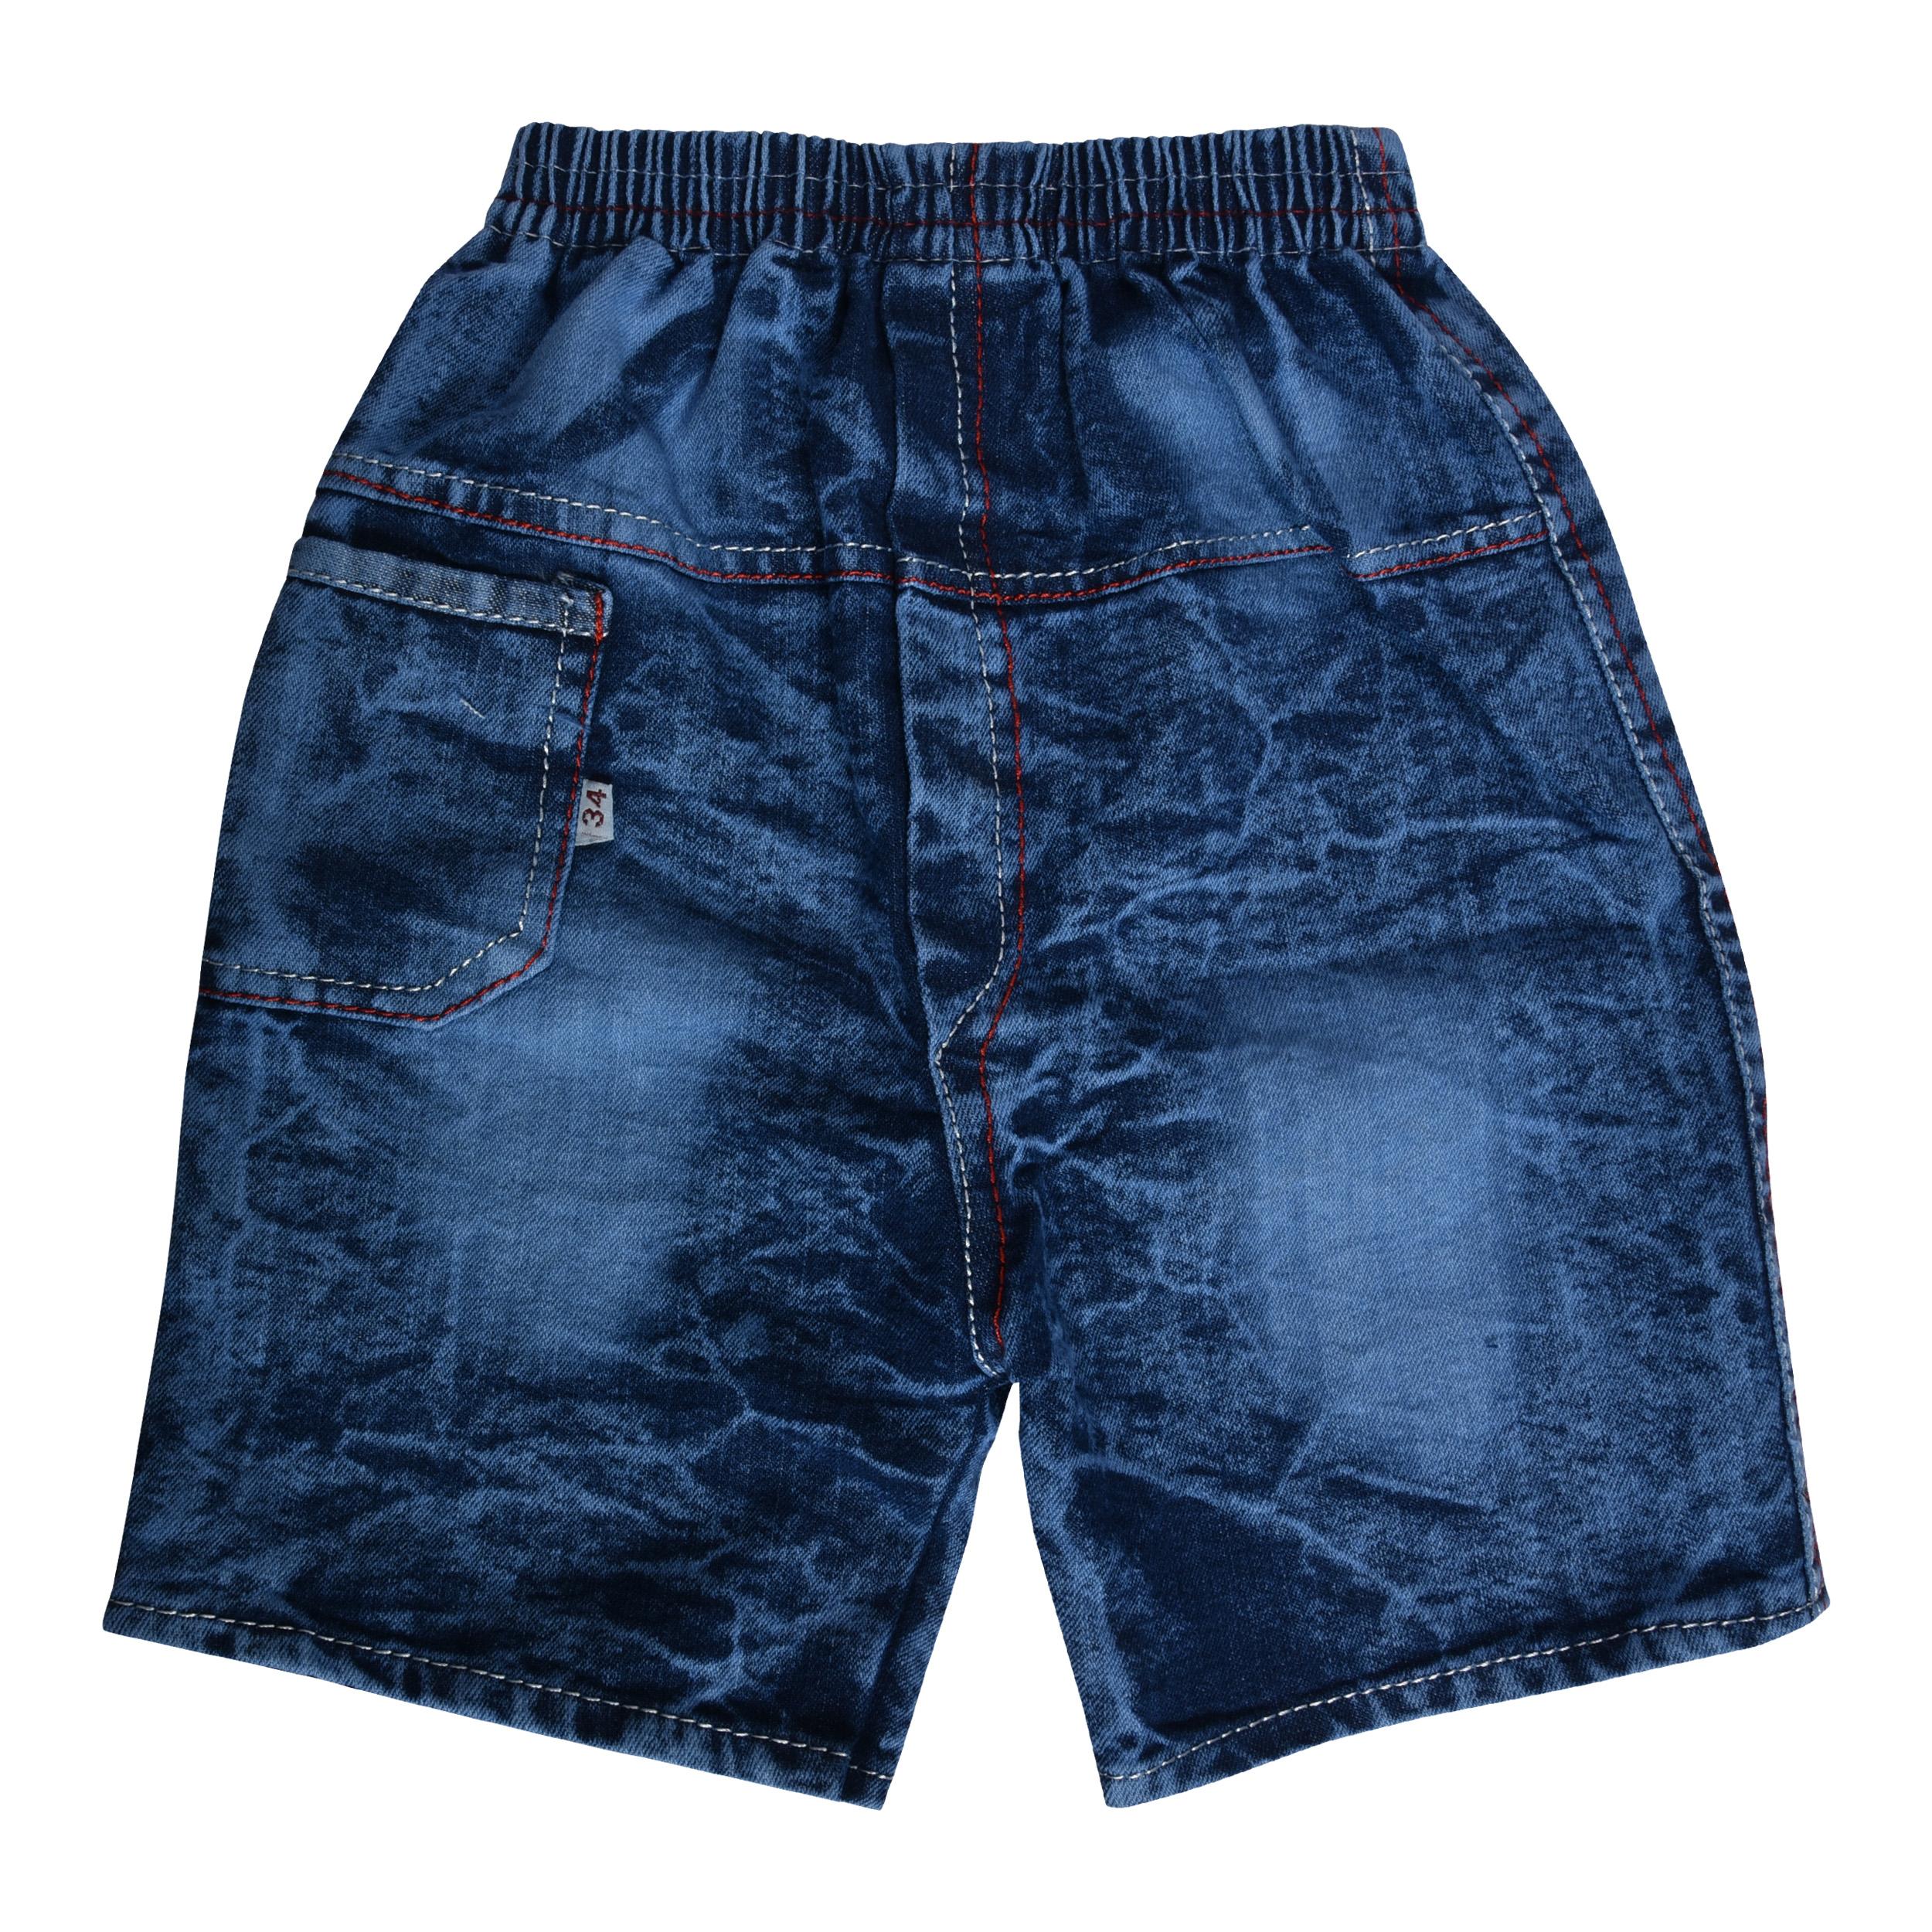 SHAURYA Short For Boys Cotton Linen Blend, Cotton Nylon Blend, Cotton Linen Blend  Blue, Pack of 2